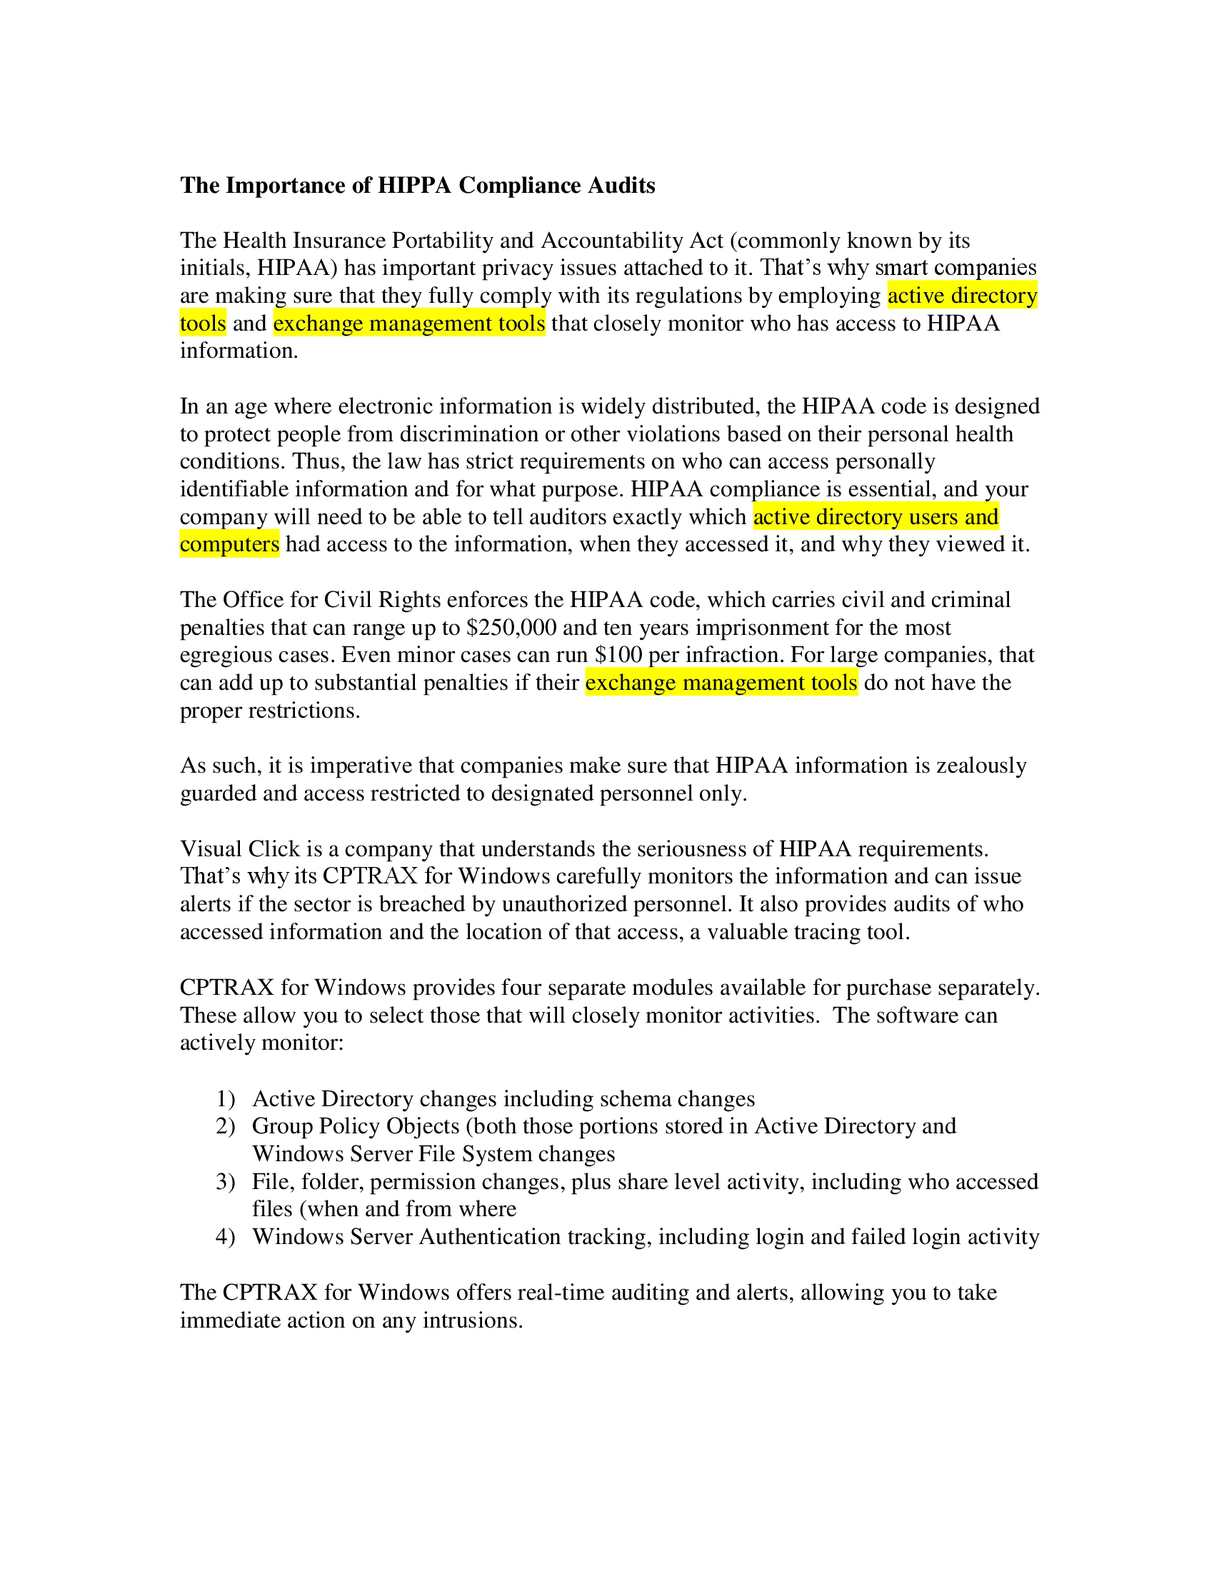 Calaméo - The Importance of HIPPA Compliance Audits